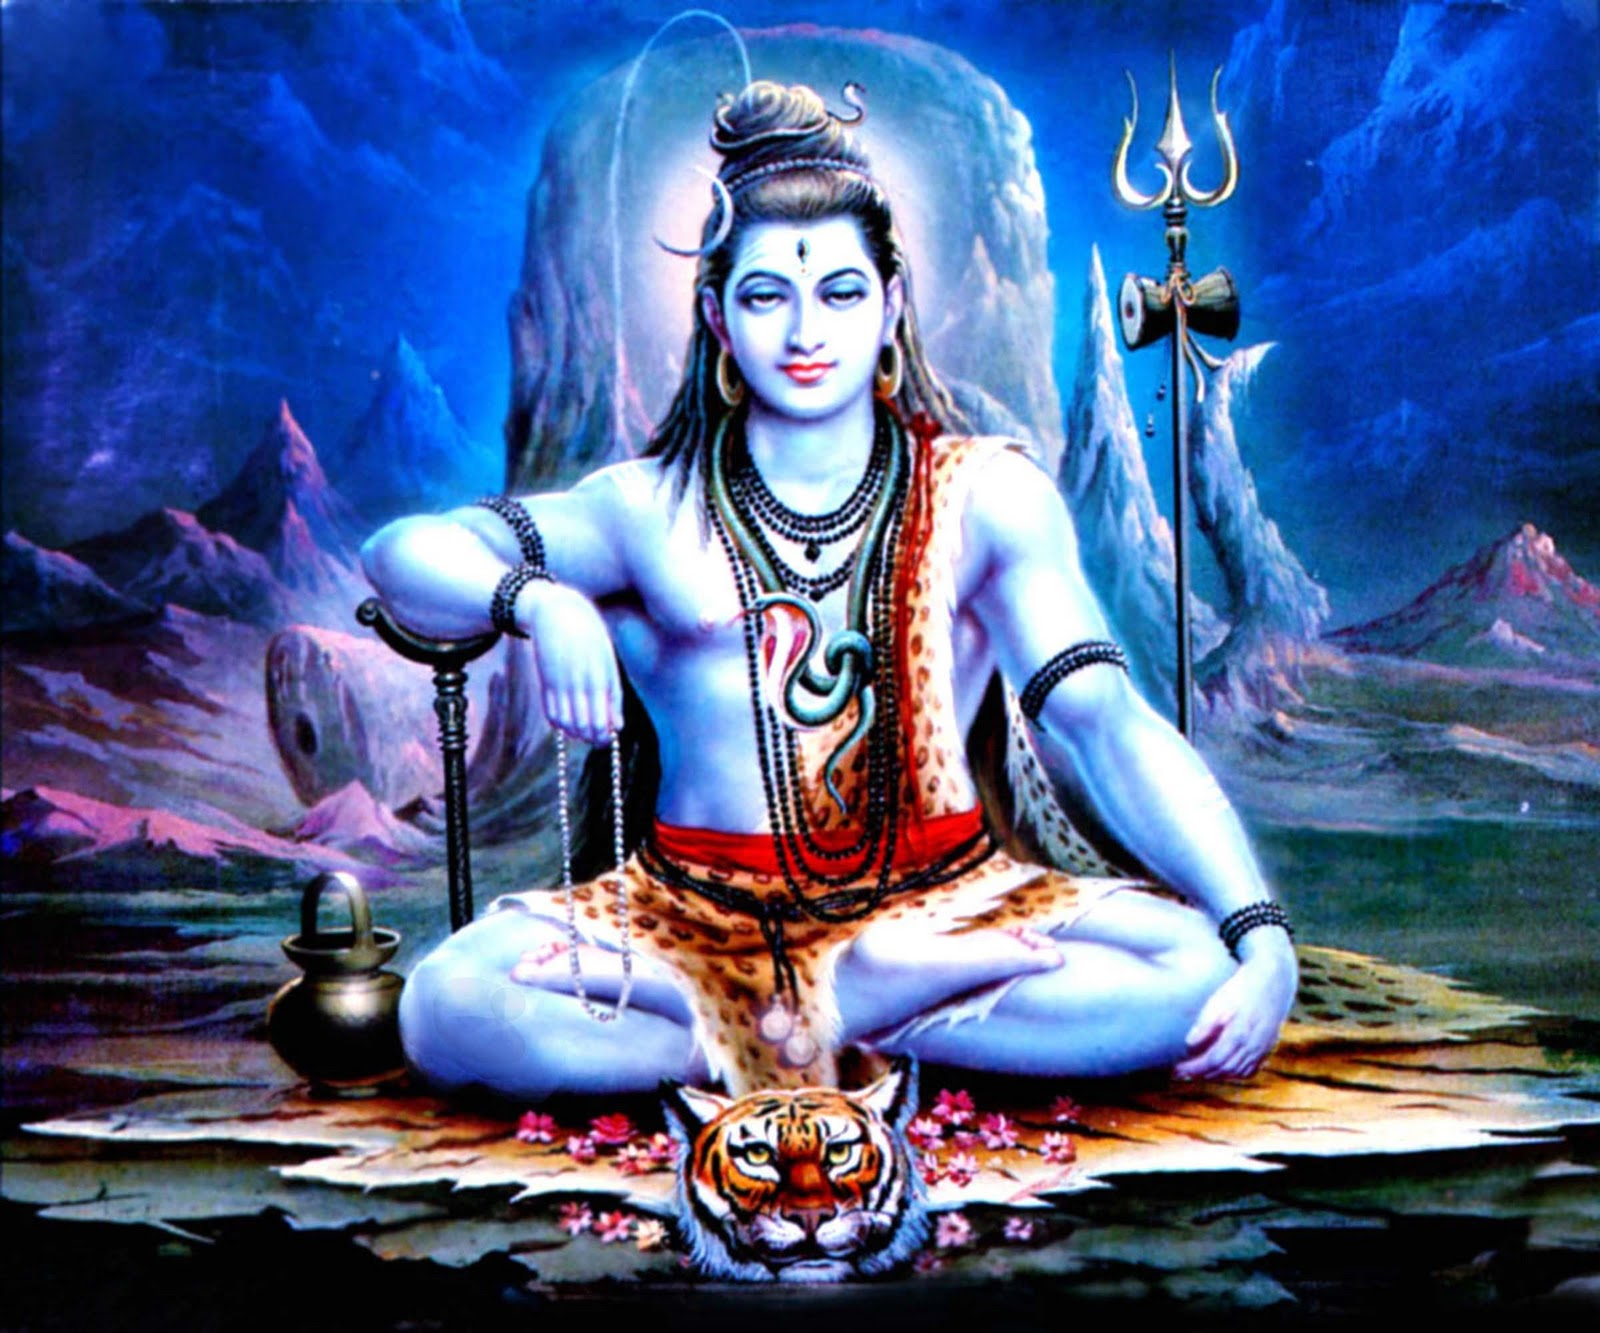 Amazing Lord Shiva Wallpapers: Kedarnath